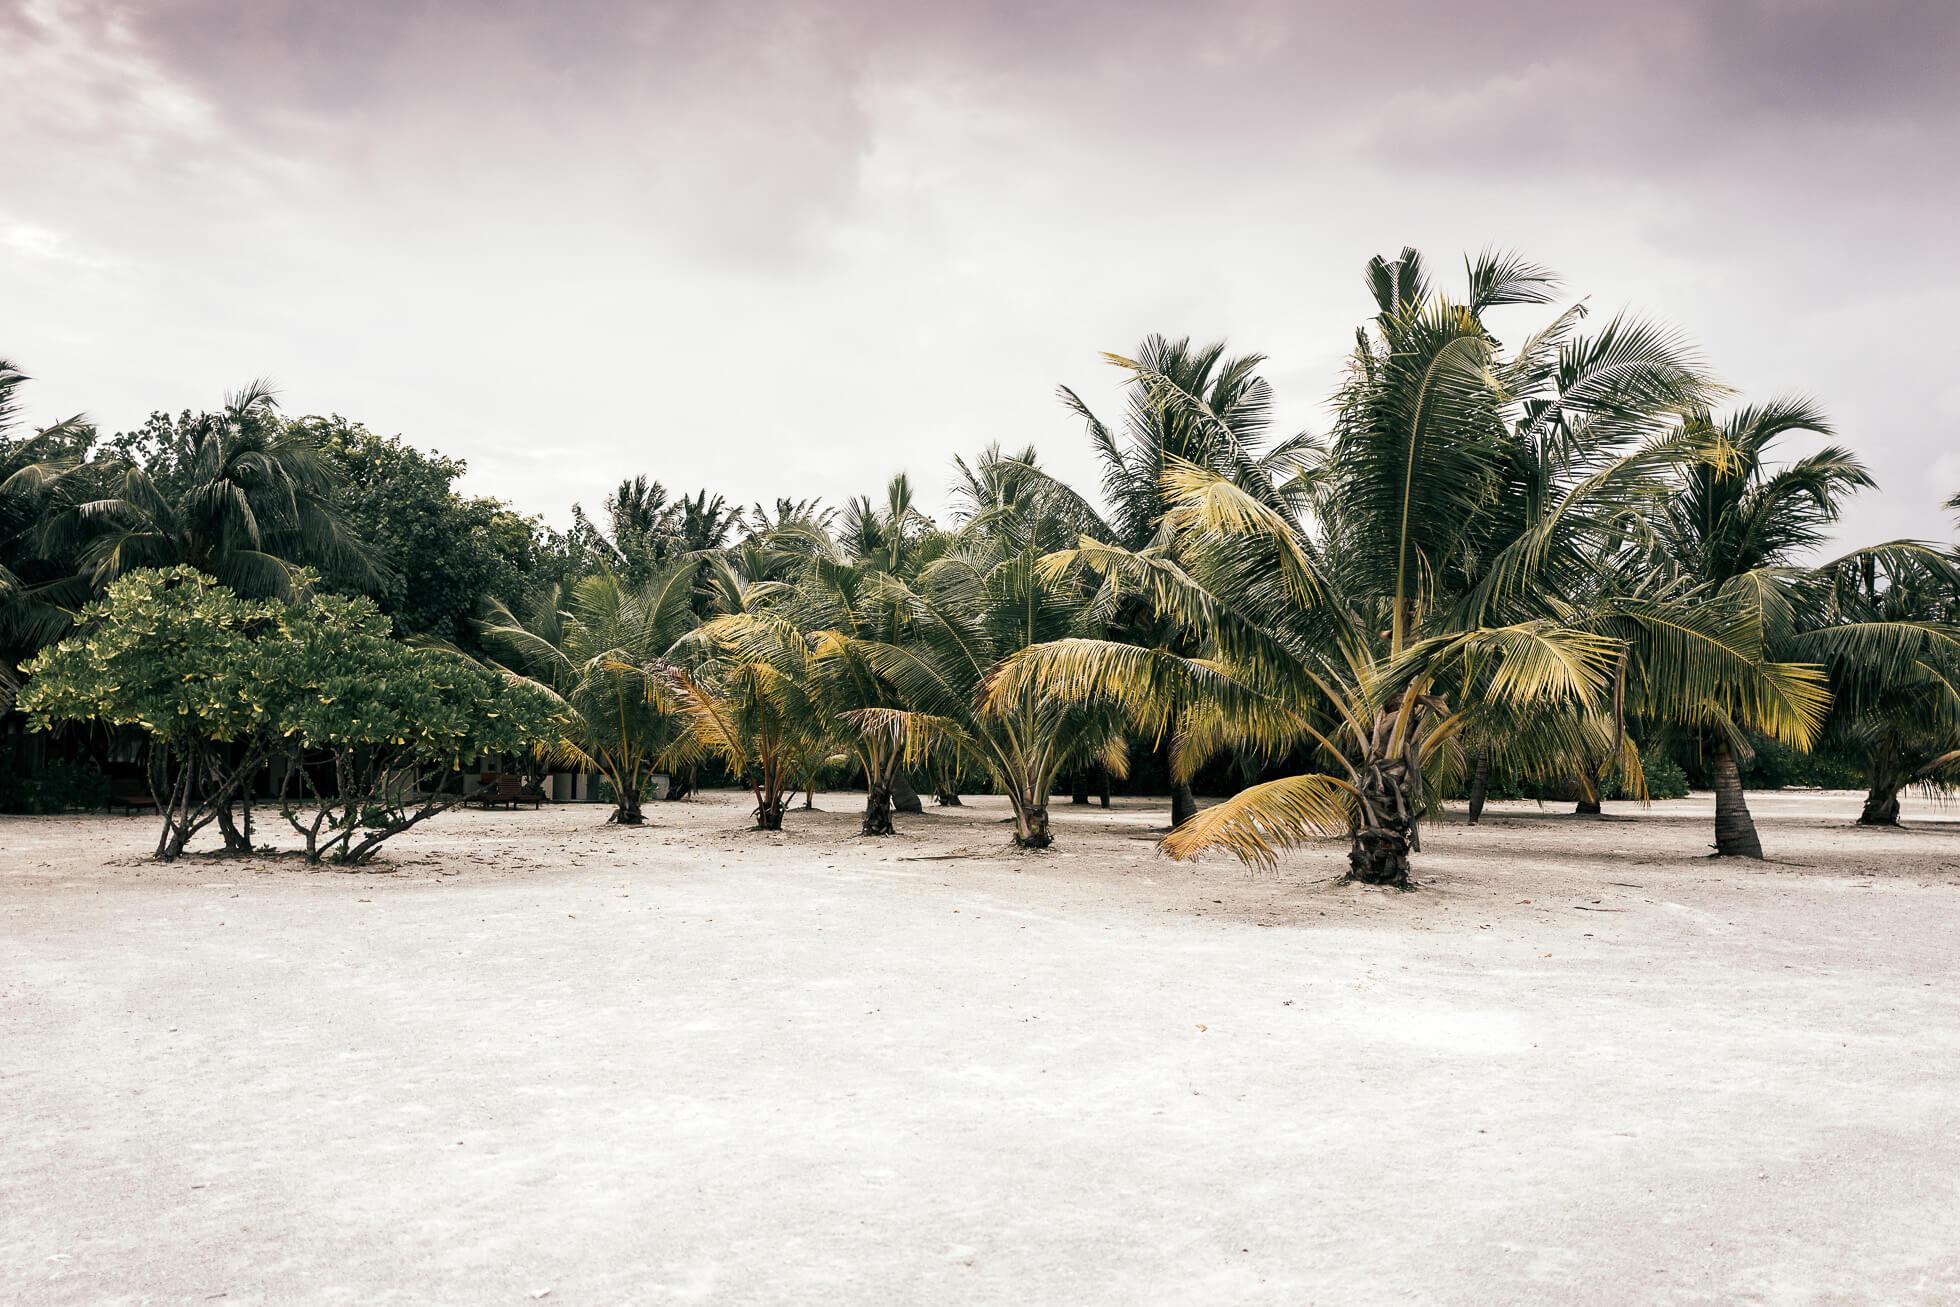 janni-deler-palm-tree-island-maldivesl1130133-redigera